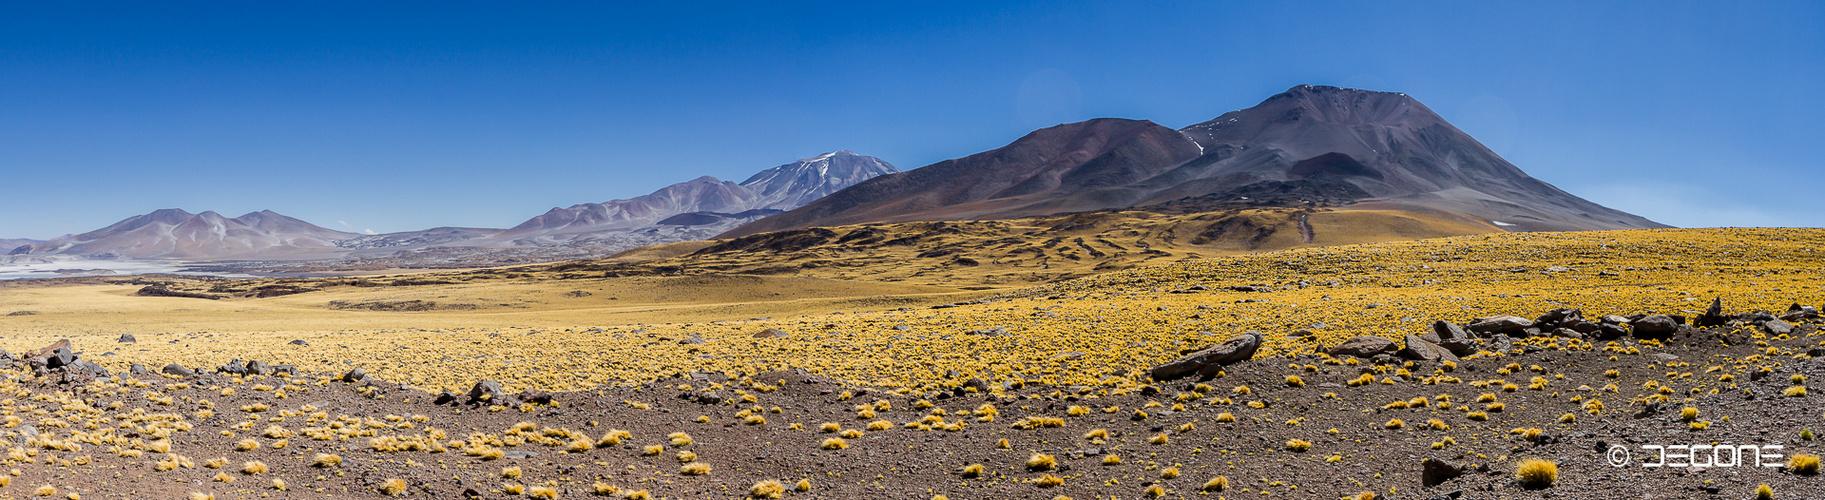 Der höchste Vulkan der Erde -  Ojos del Salado